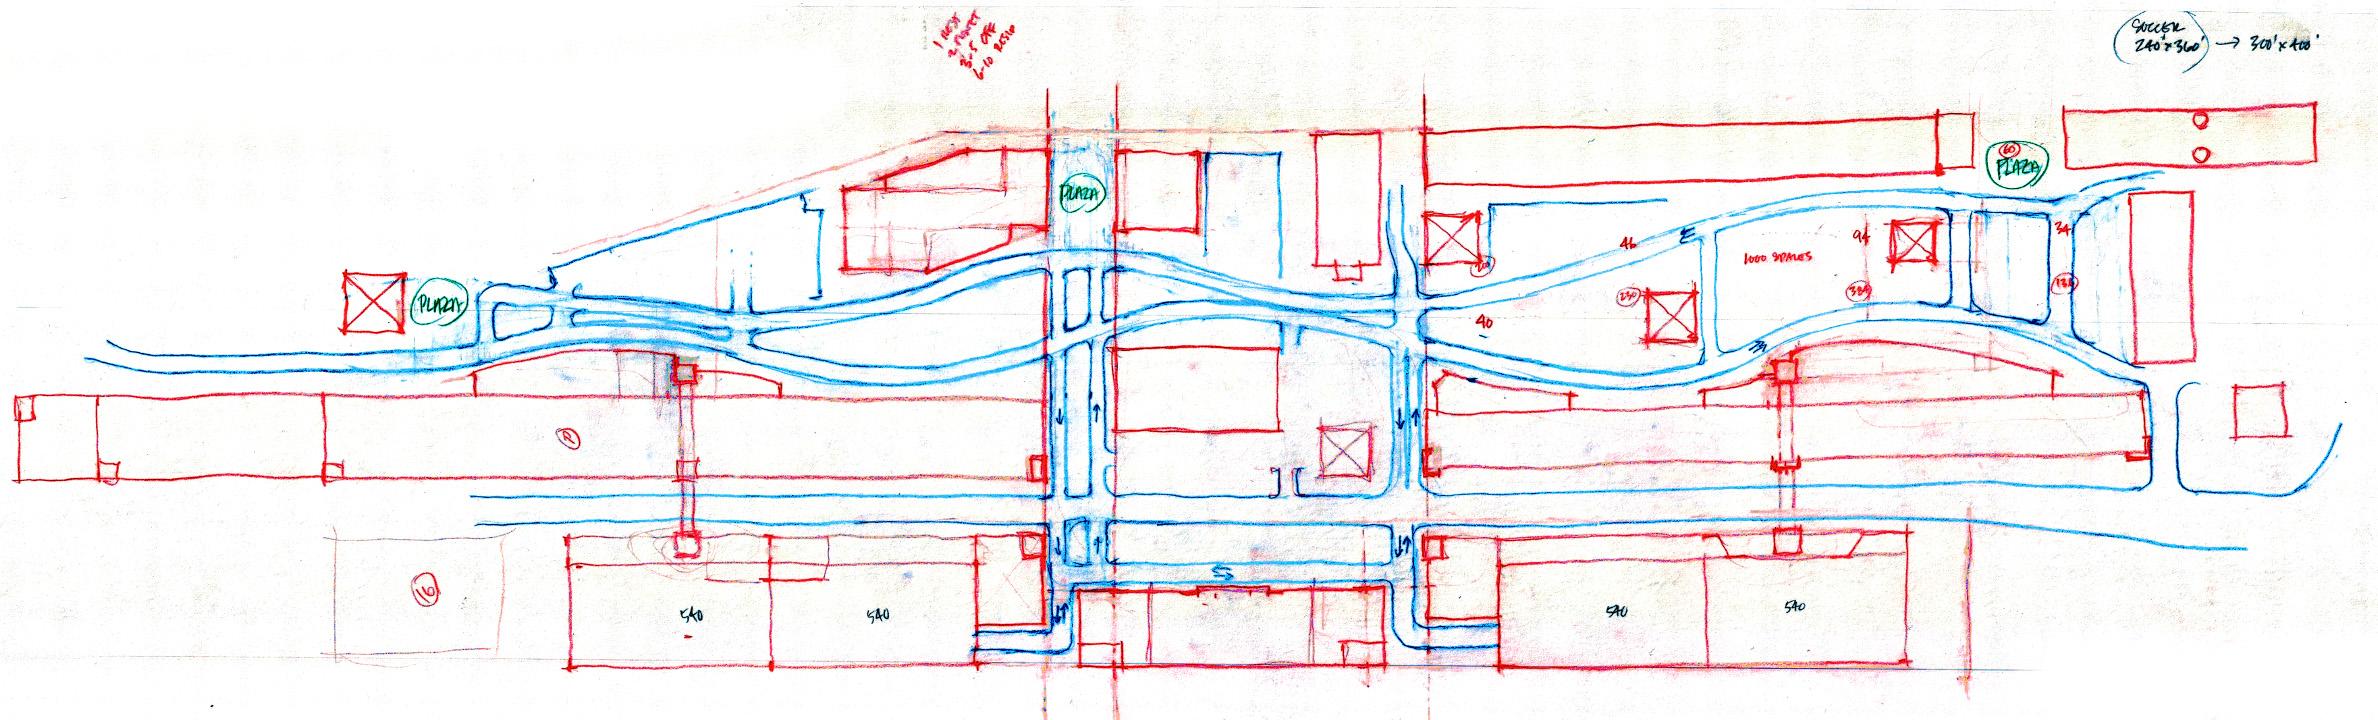 Riverwalk - Site Movement Diagram Transitioning to Site Plan